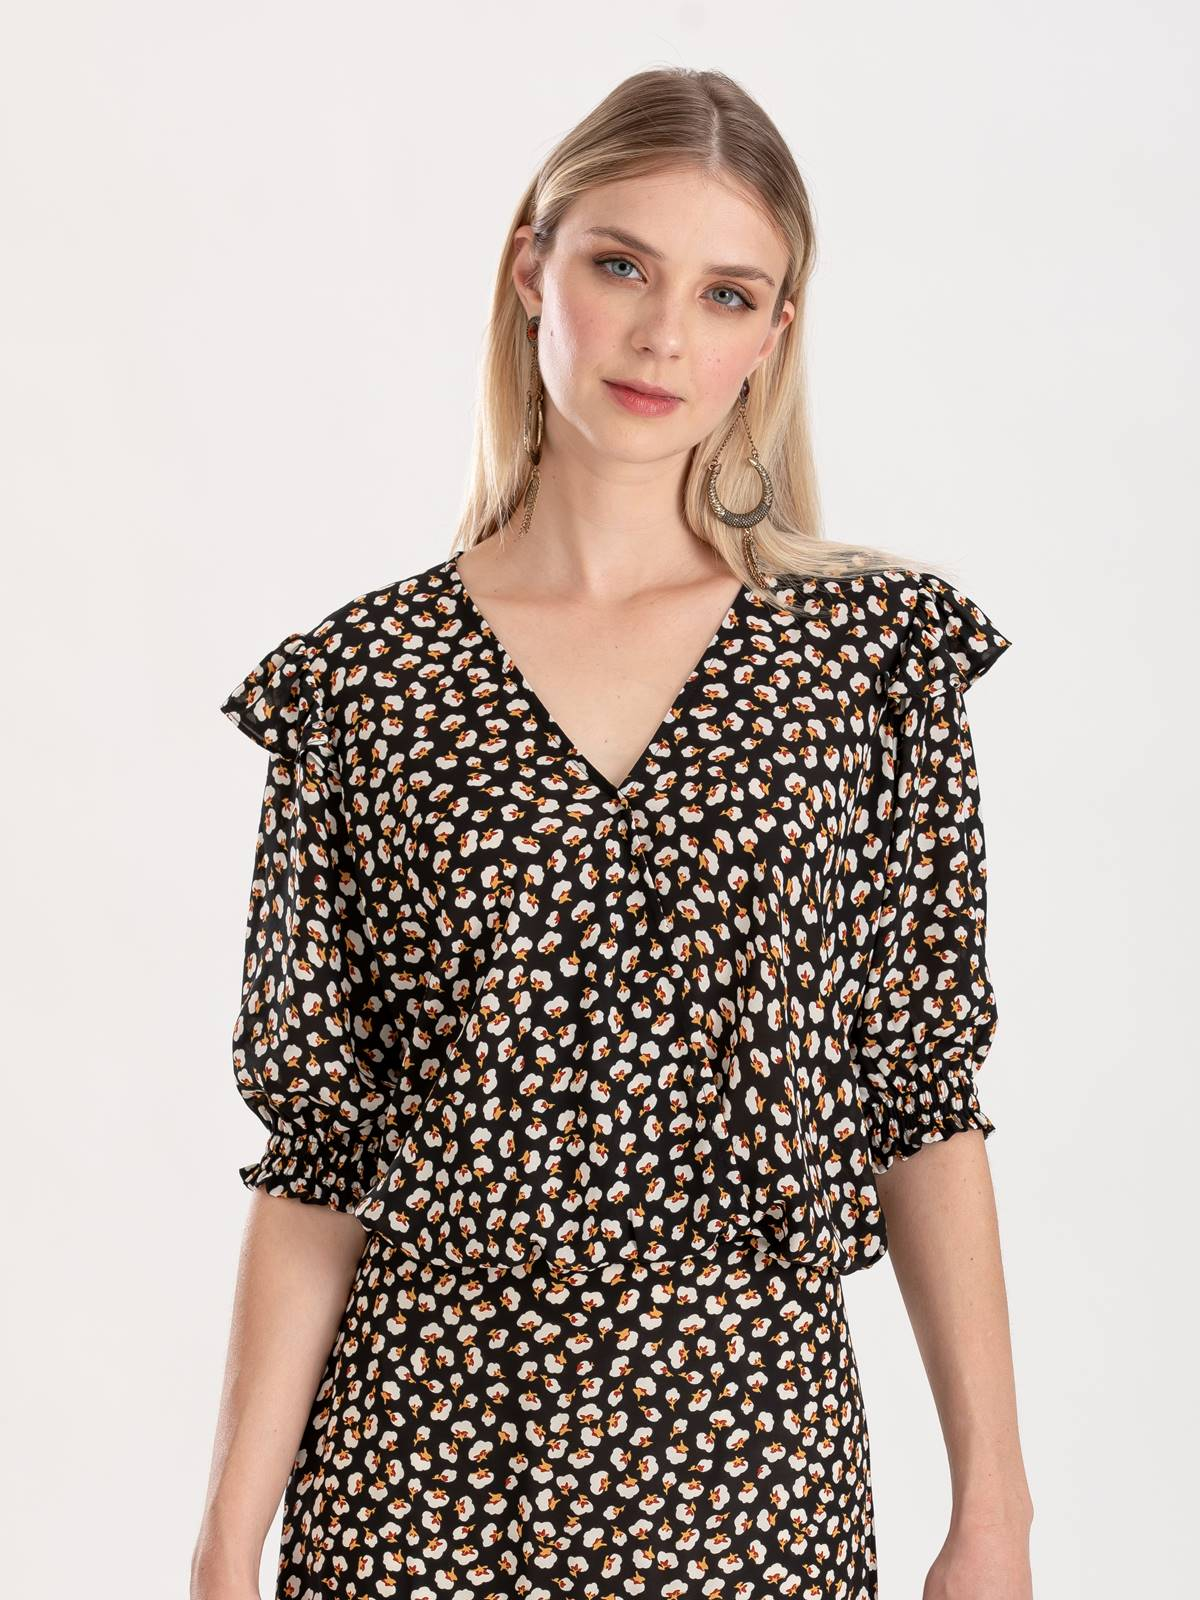 Blusa preta com estampa floral Ref: F12363